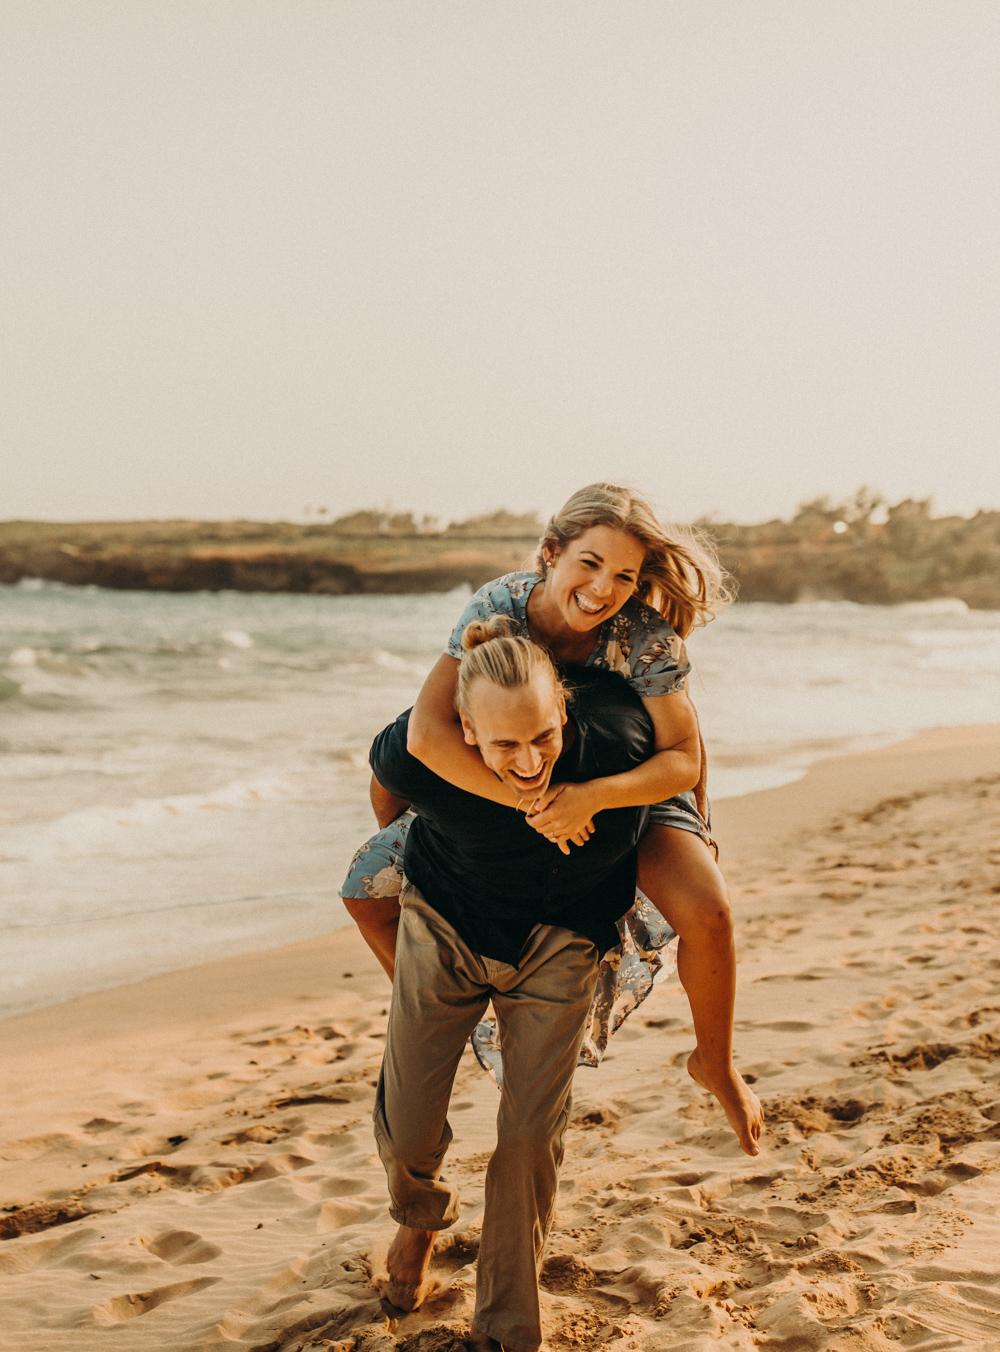 kauai-hawaii-beach-engagement-wedding-photography-20180702-079A0498.jpg